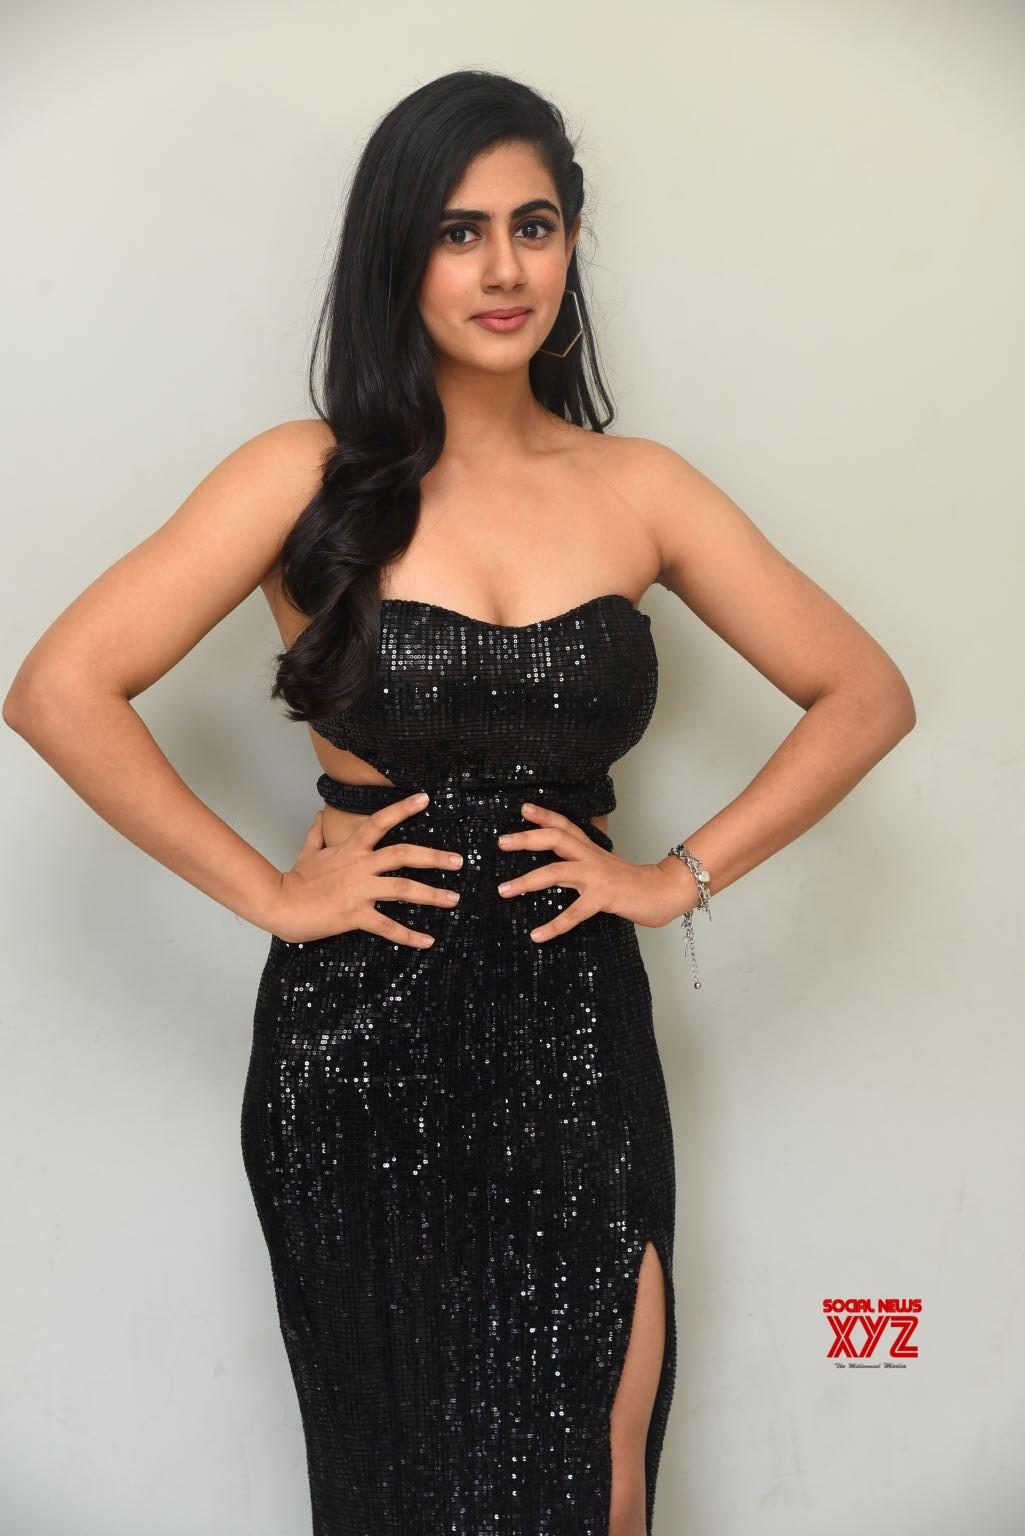 Actress Gehna Sippy Hot Glam Stills From My South Diva 2020 Calendar Launch